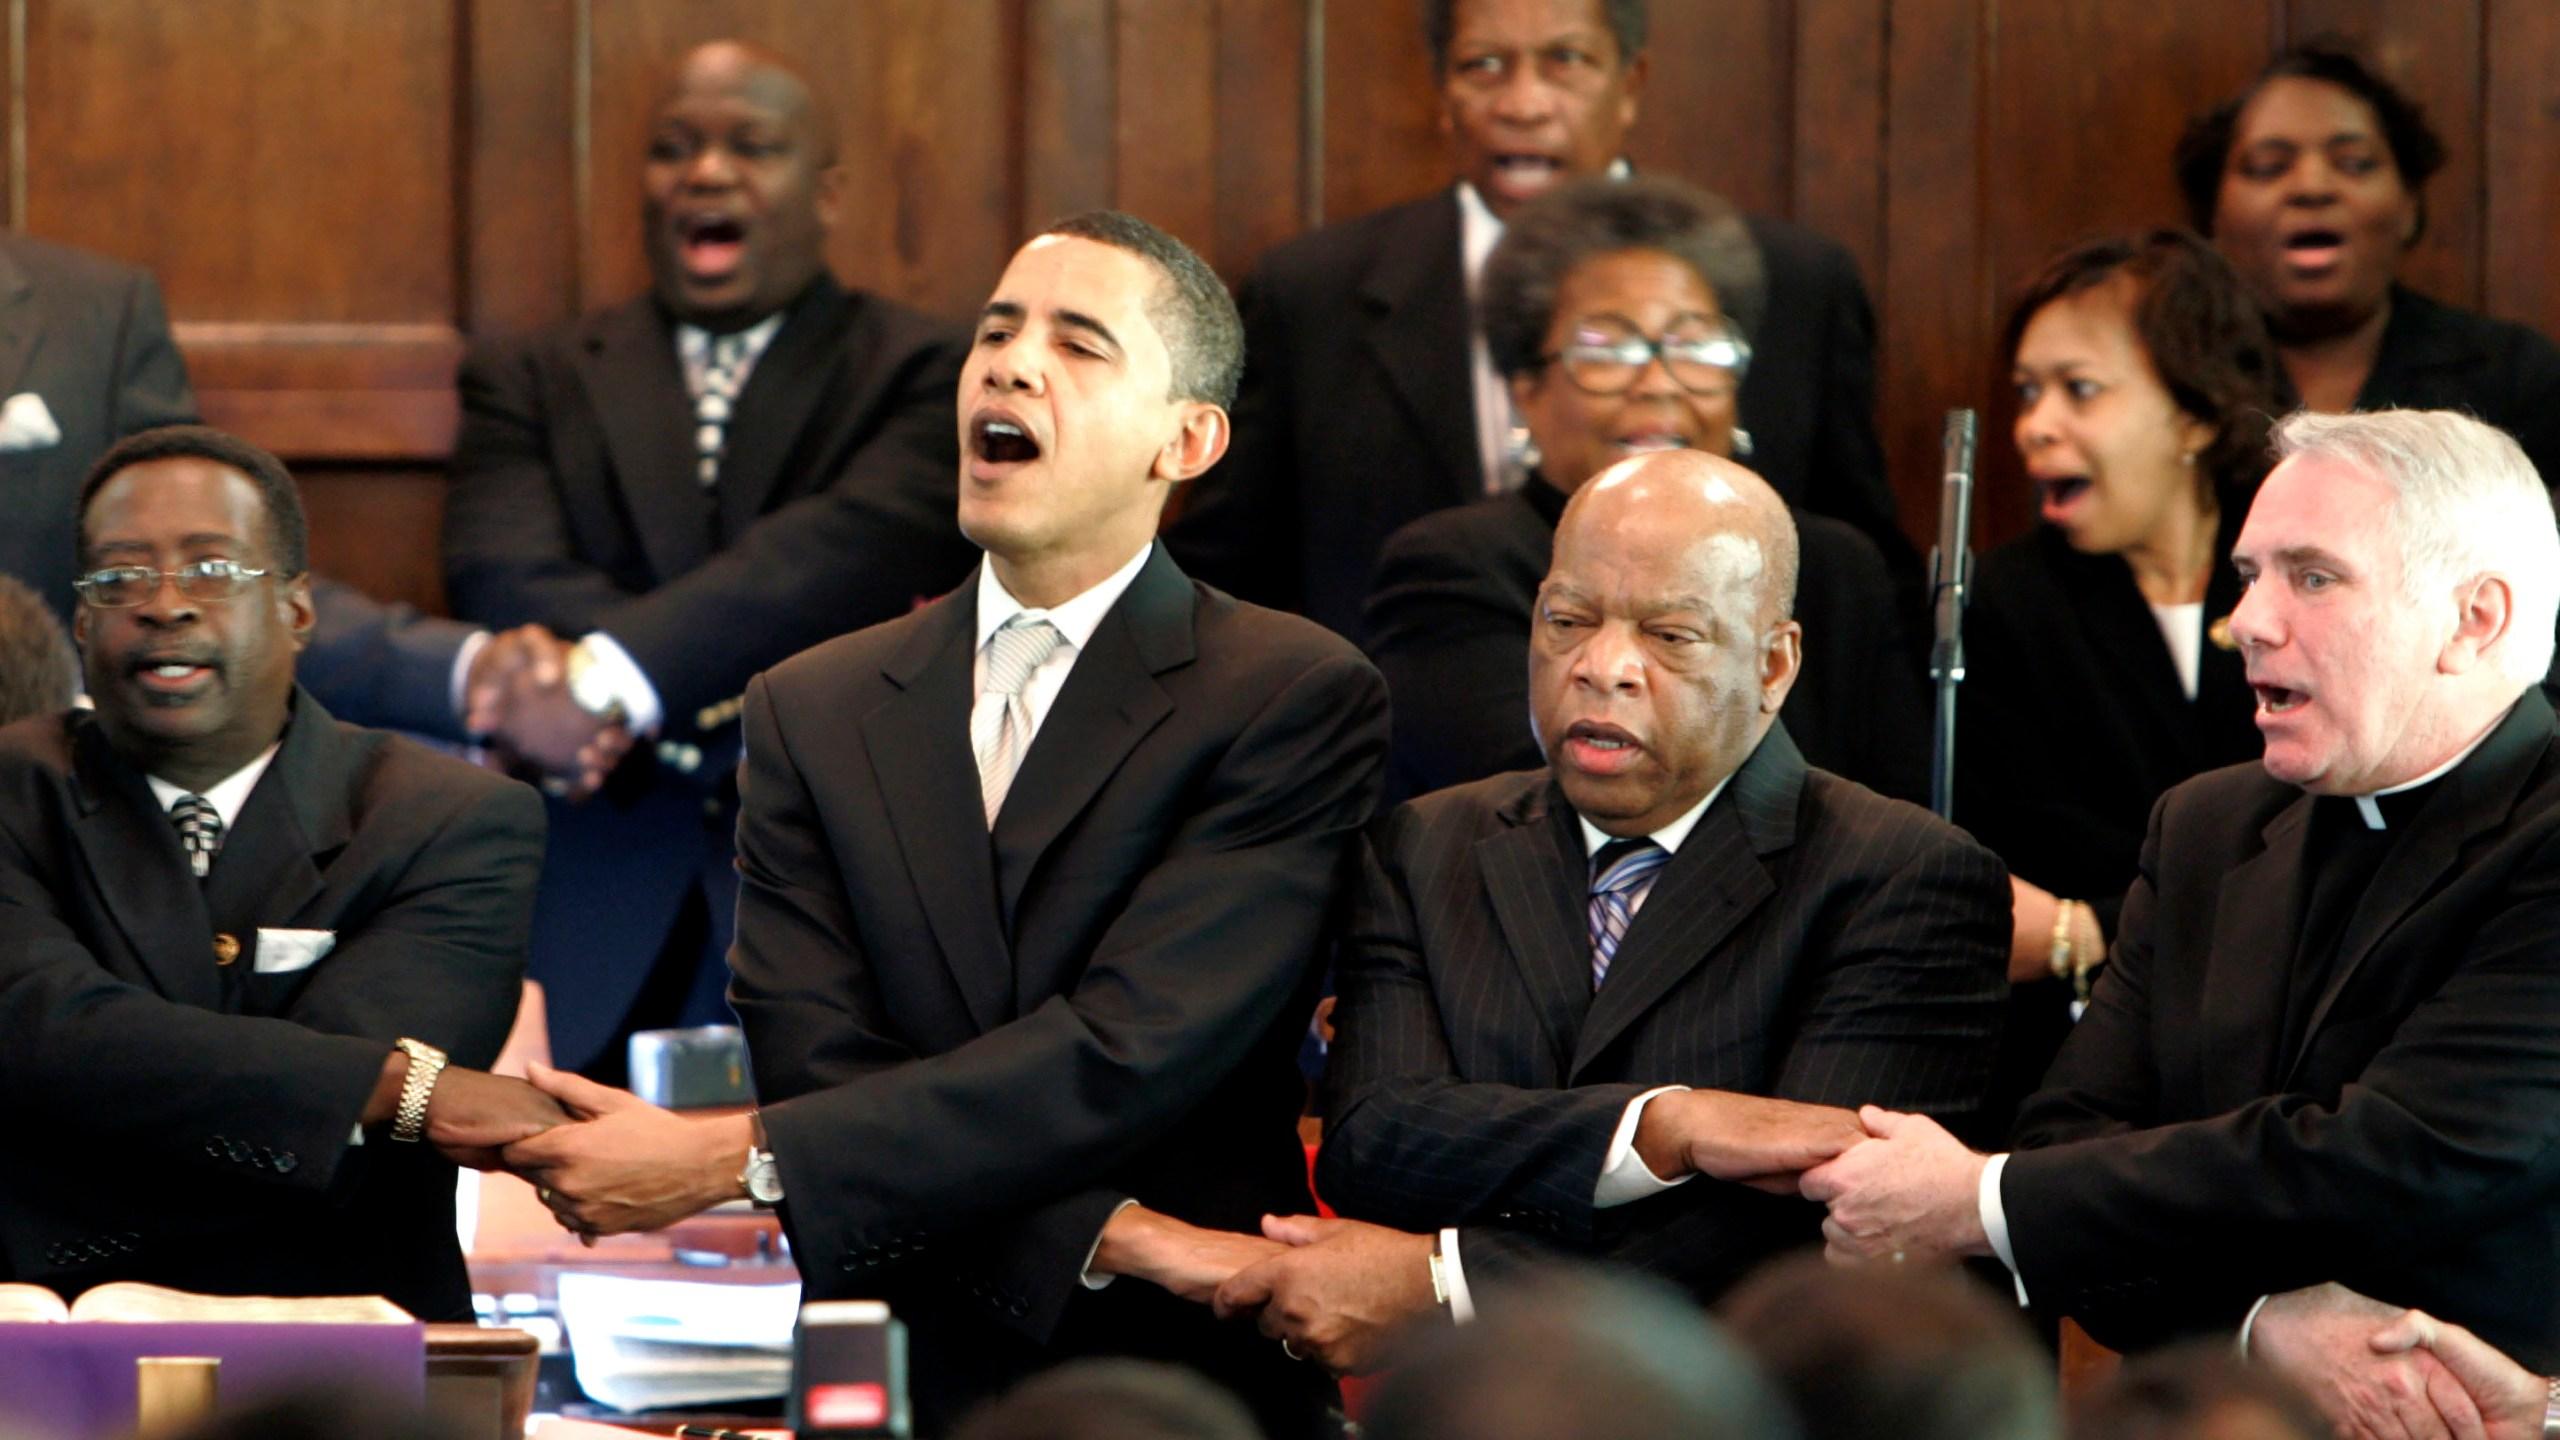 Barack Obama, John Lewis, James Jackson, Clete Kiley